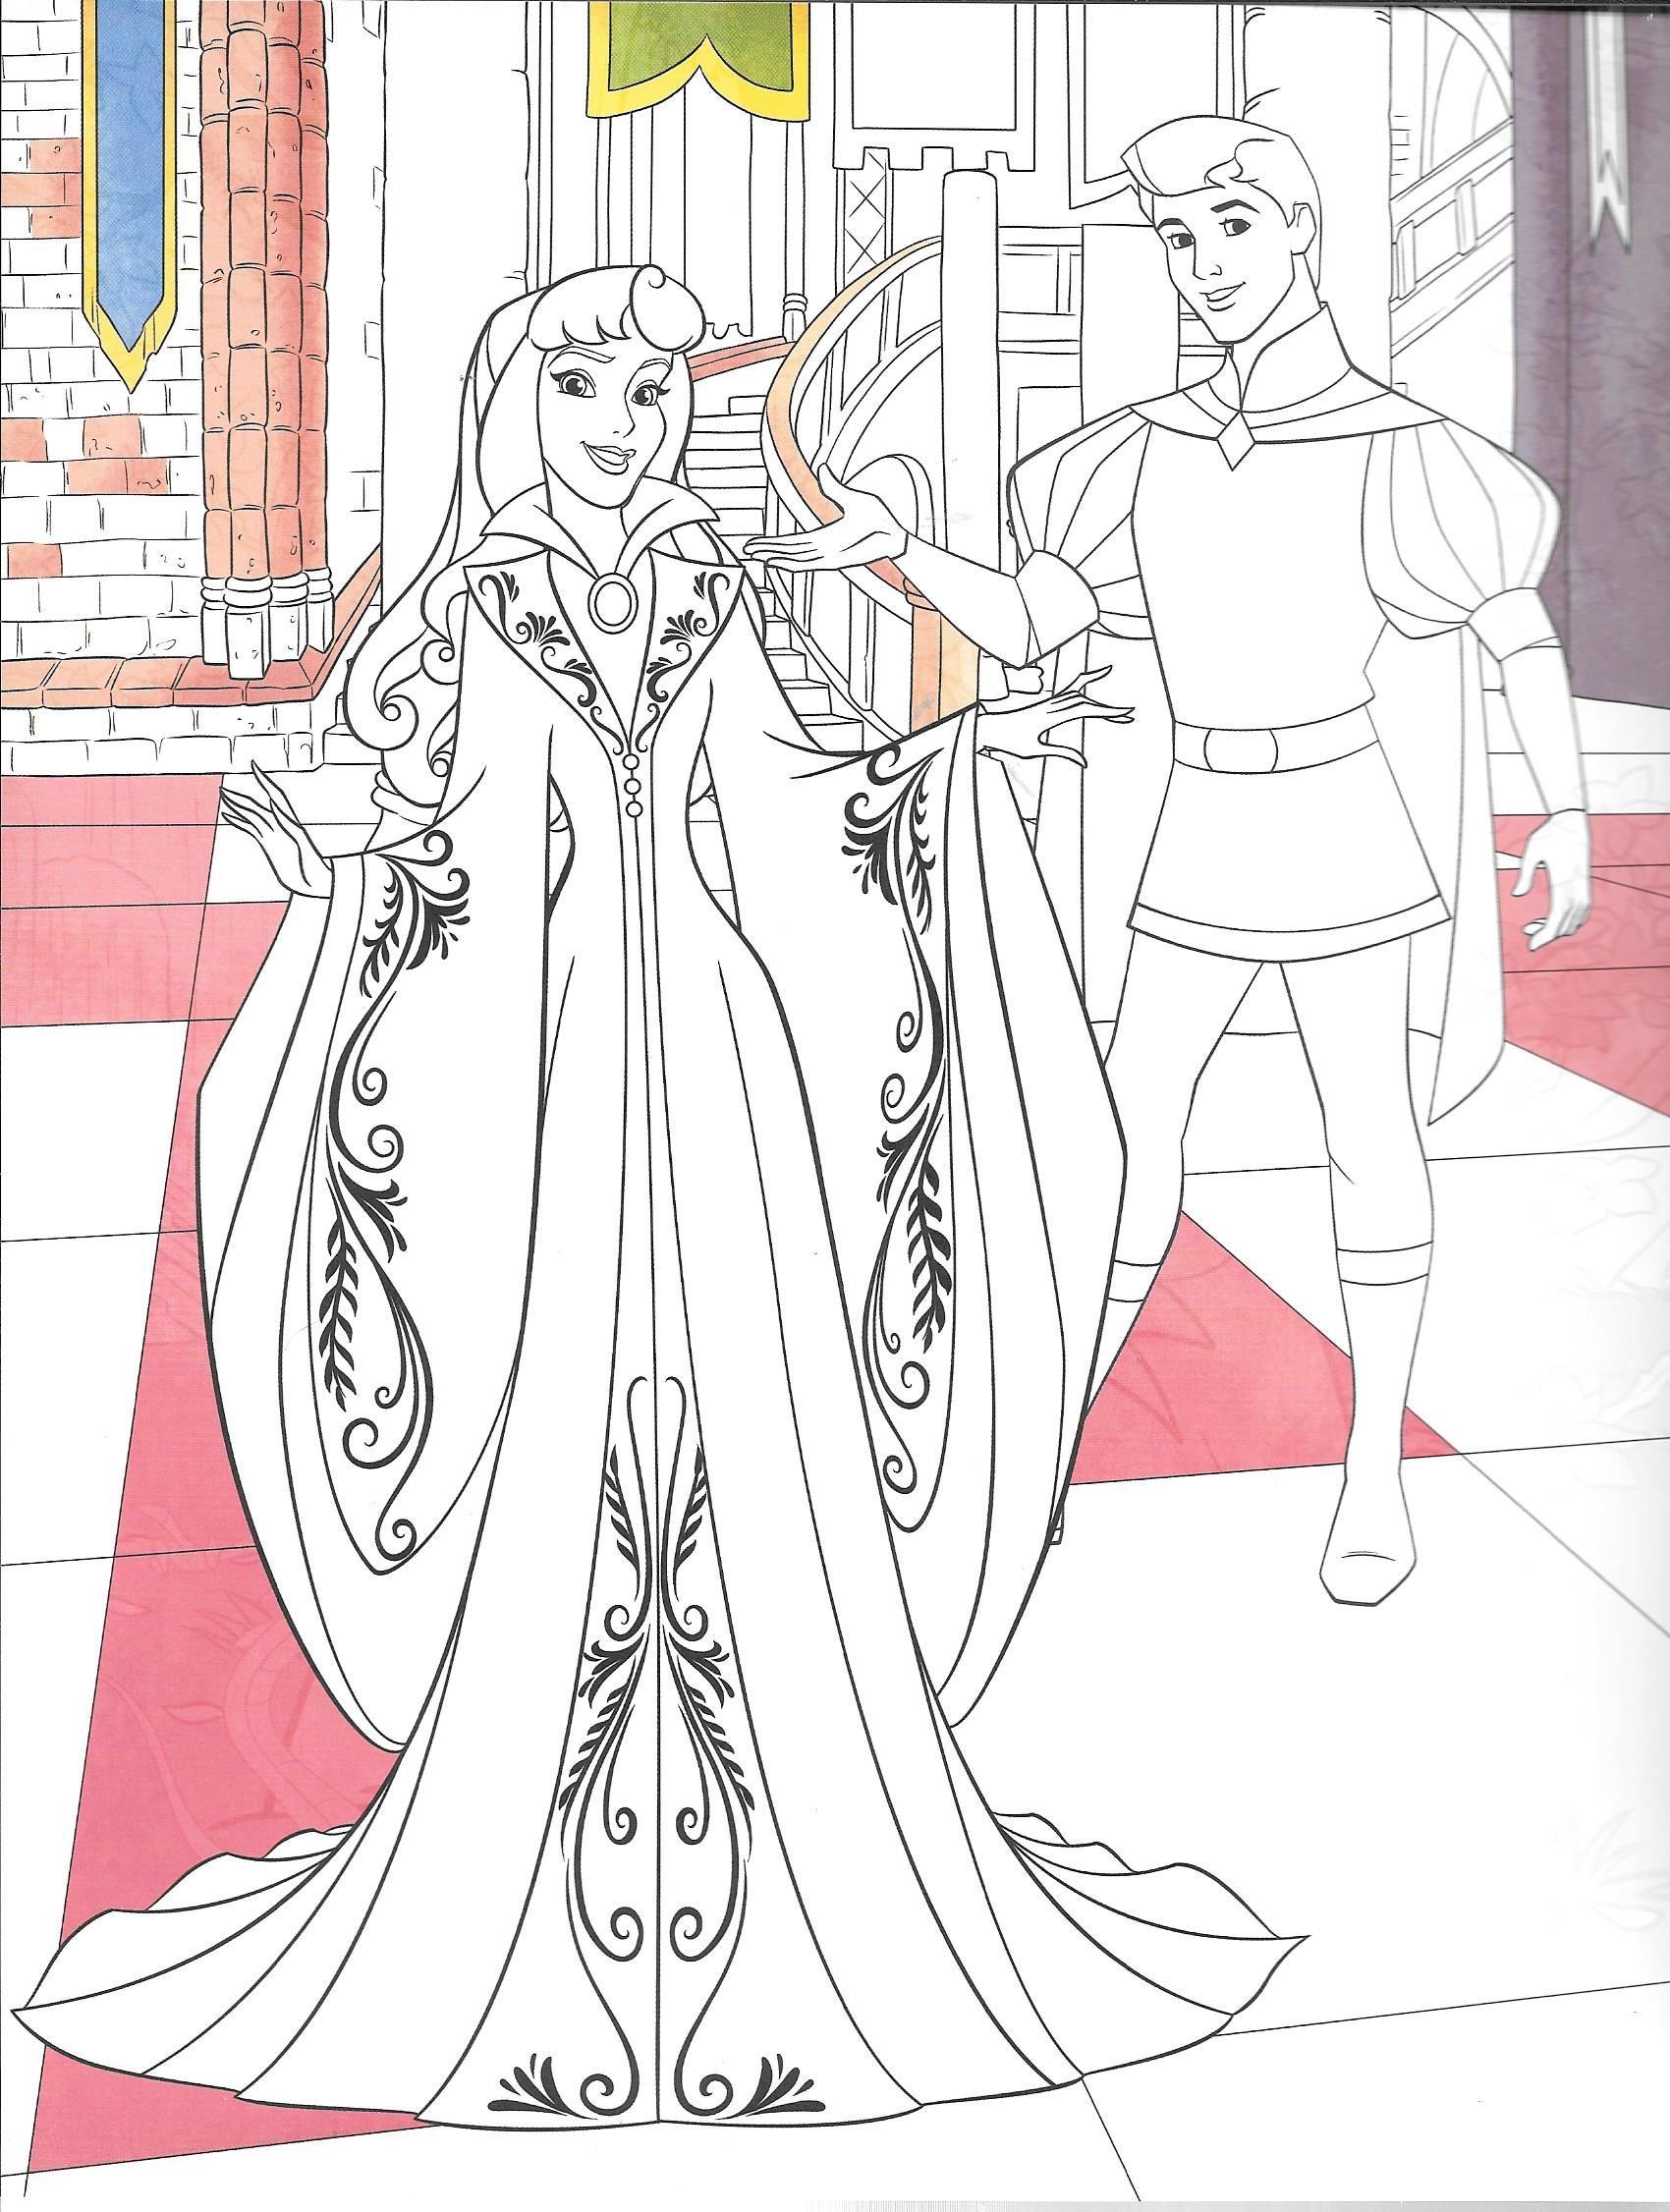 Pin By Hilchevska Kristina On Disney Princess Disney Coloring Sheets Disney Princess Coloring Pages Disney Coloring Pages